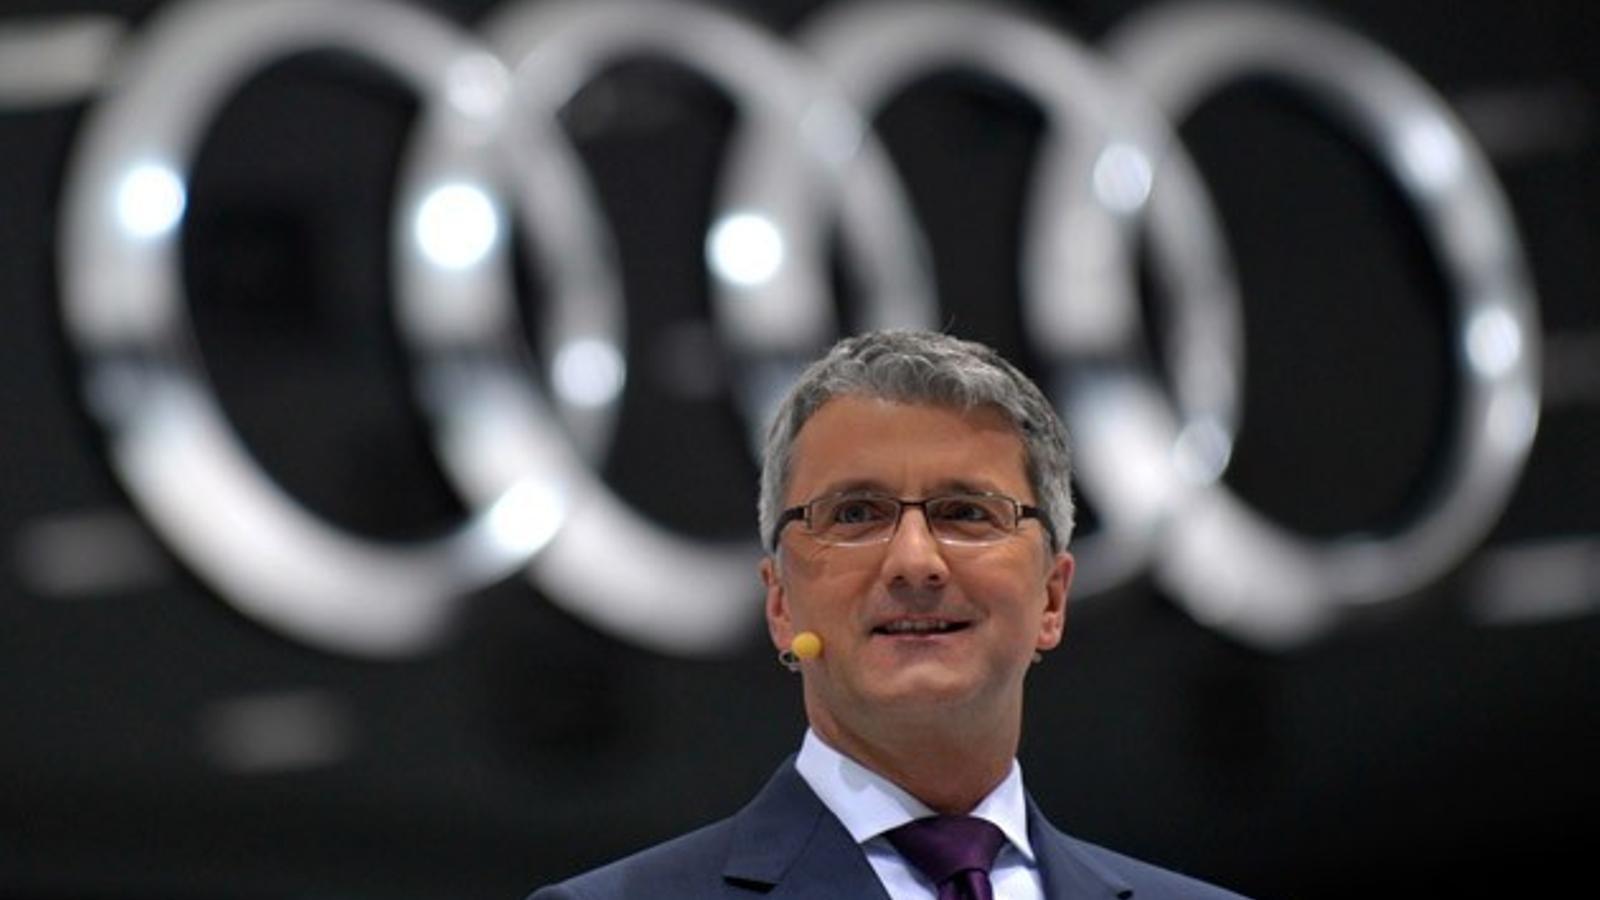 La policia alemanya deté el president d'Audi pel Dieselgate